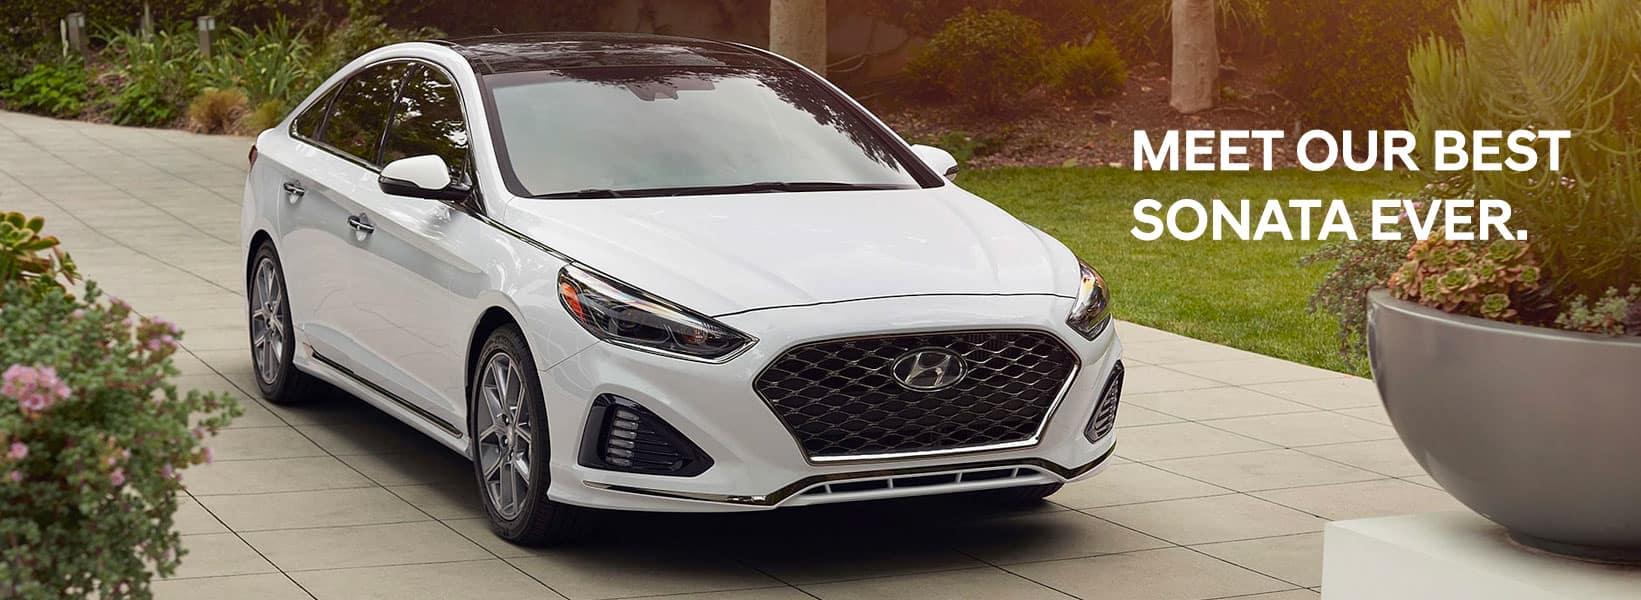 2019 Hyundai Sonata Chicago IL